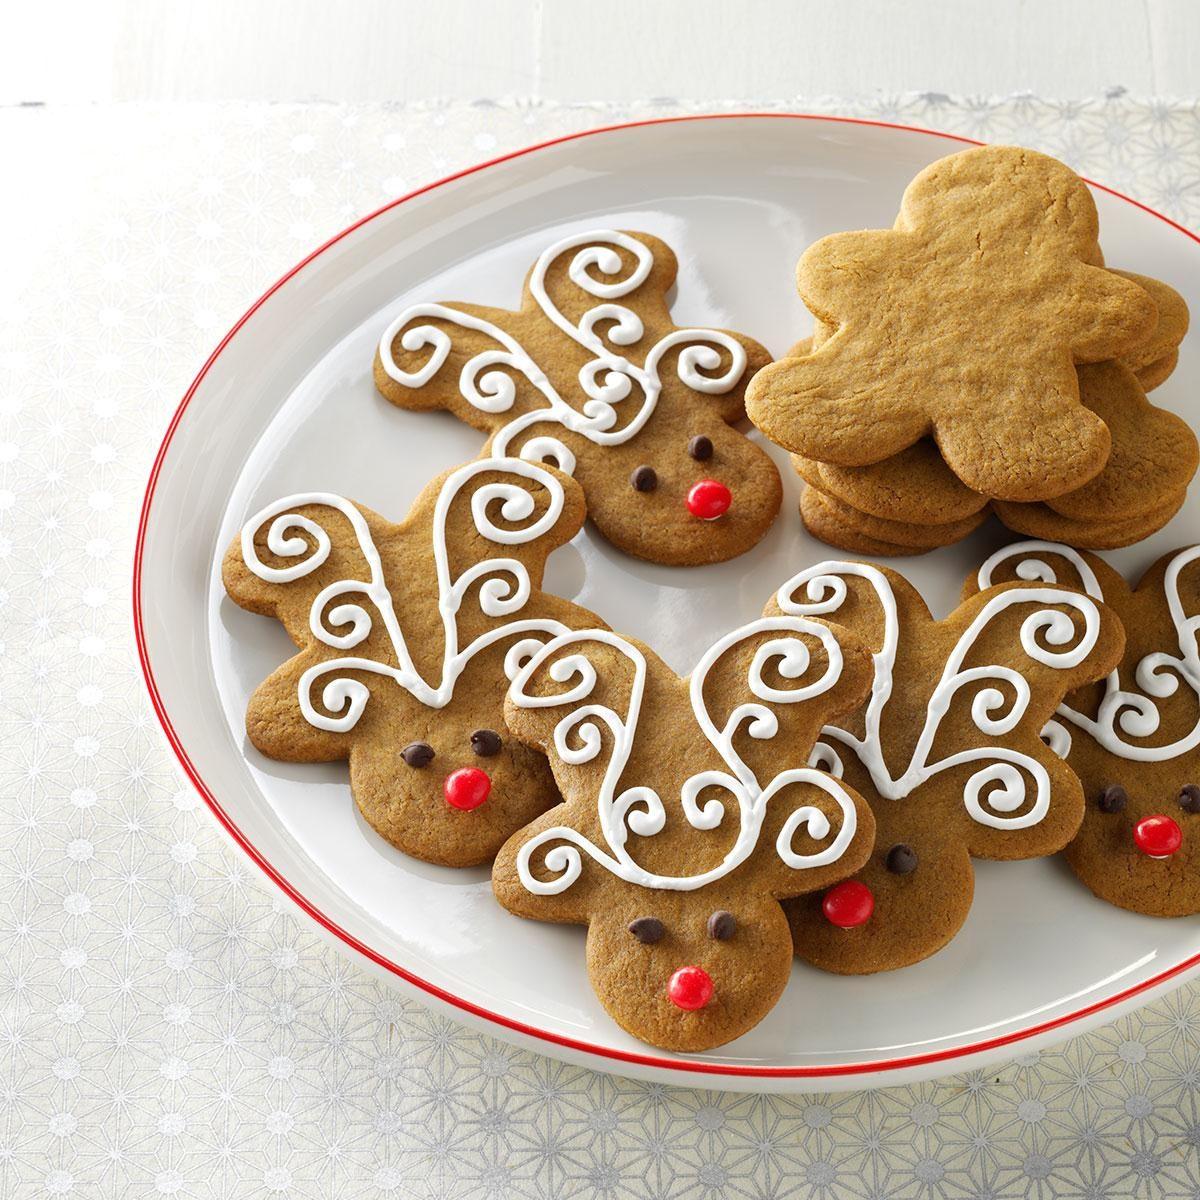 Brunch Quotes Jolly Ginger Reindeer Cookies Recipe Taste Of Home